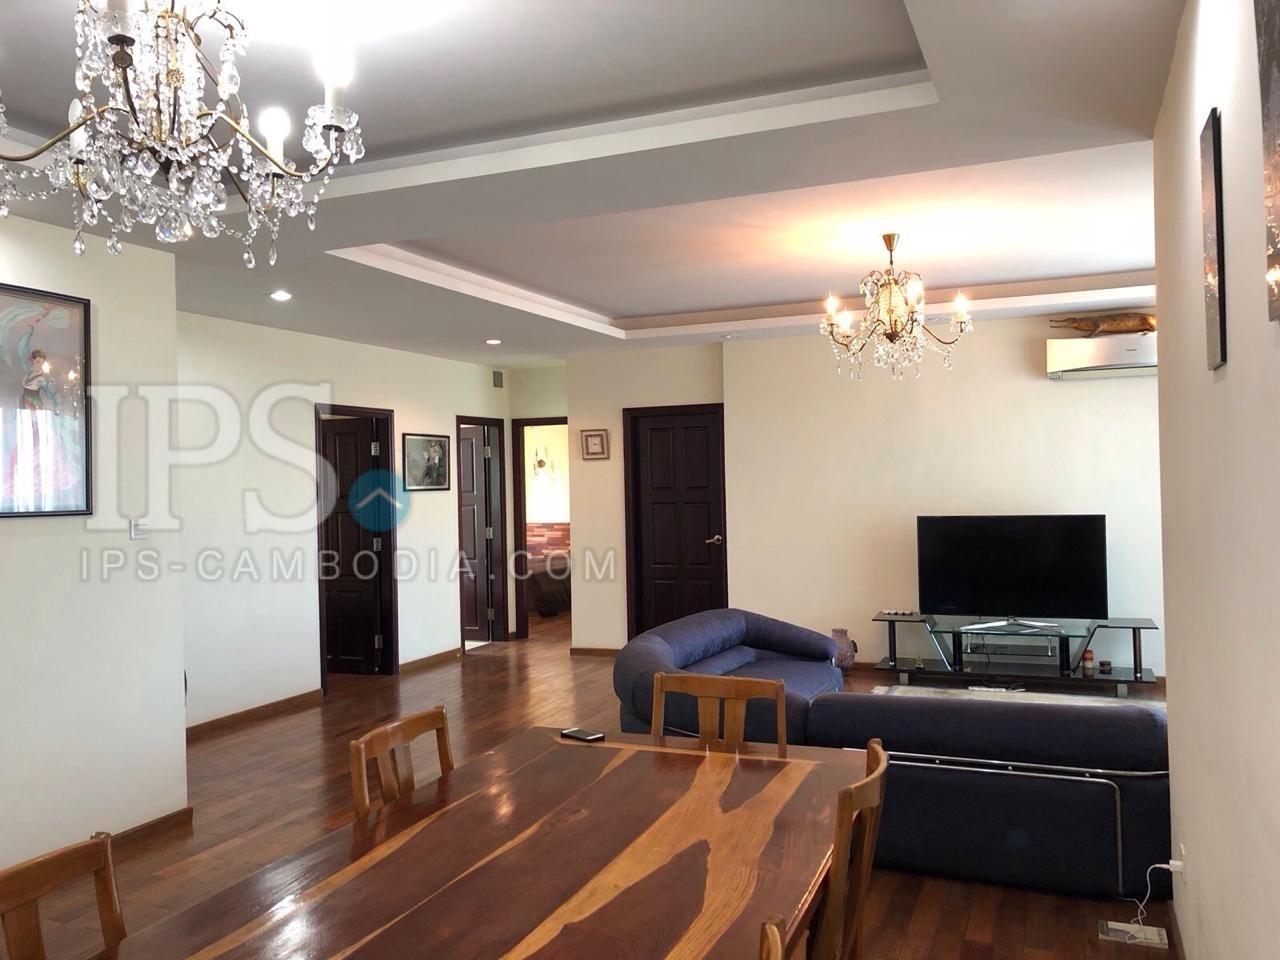 3 Bedroom  Apartment  For Rent - Tonle Bassac, Phnom Penh